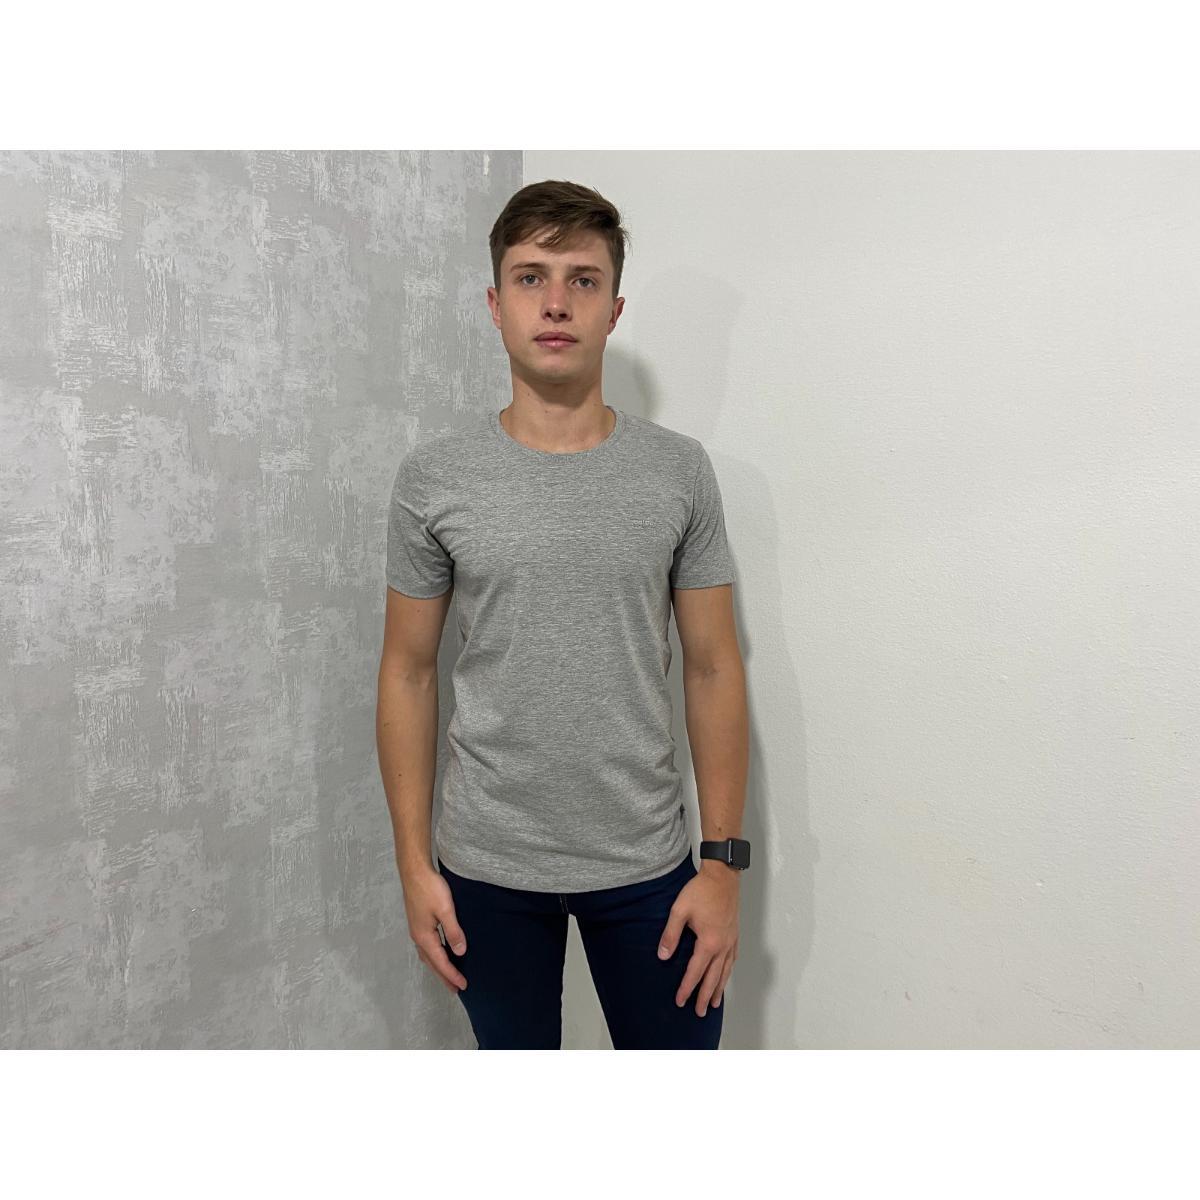 Camiseta Masculina Colcci 350107768 63007 Mescla